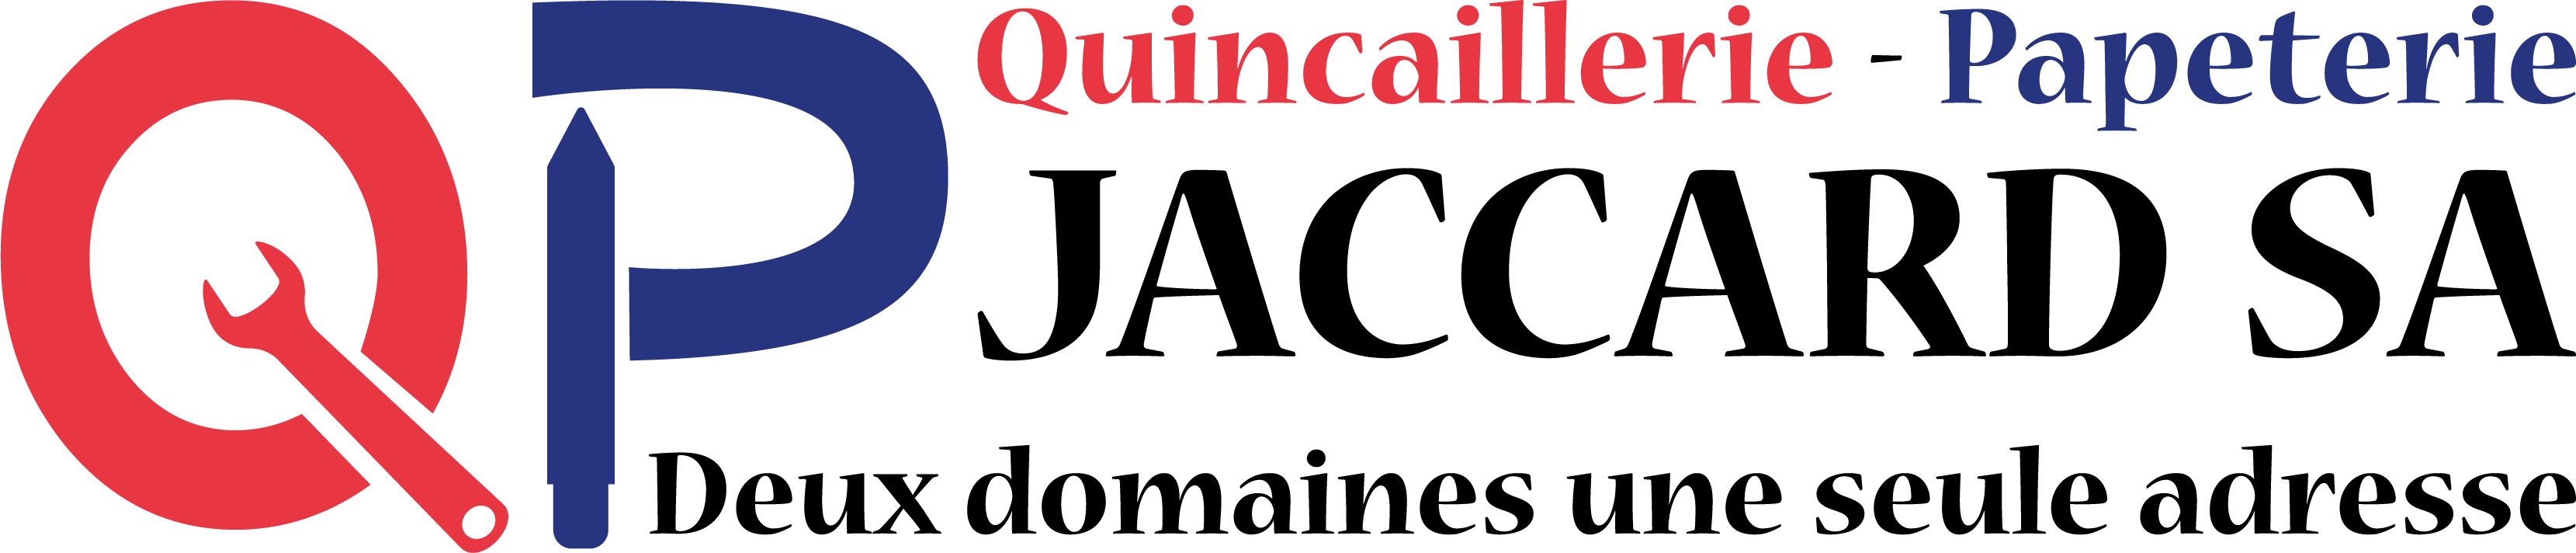 Quincaillerie Jaccard